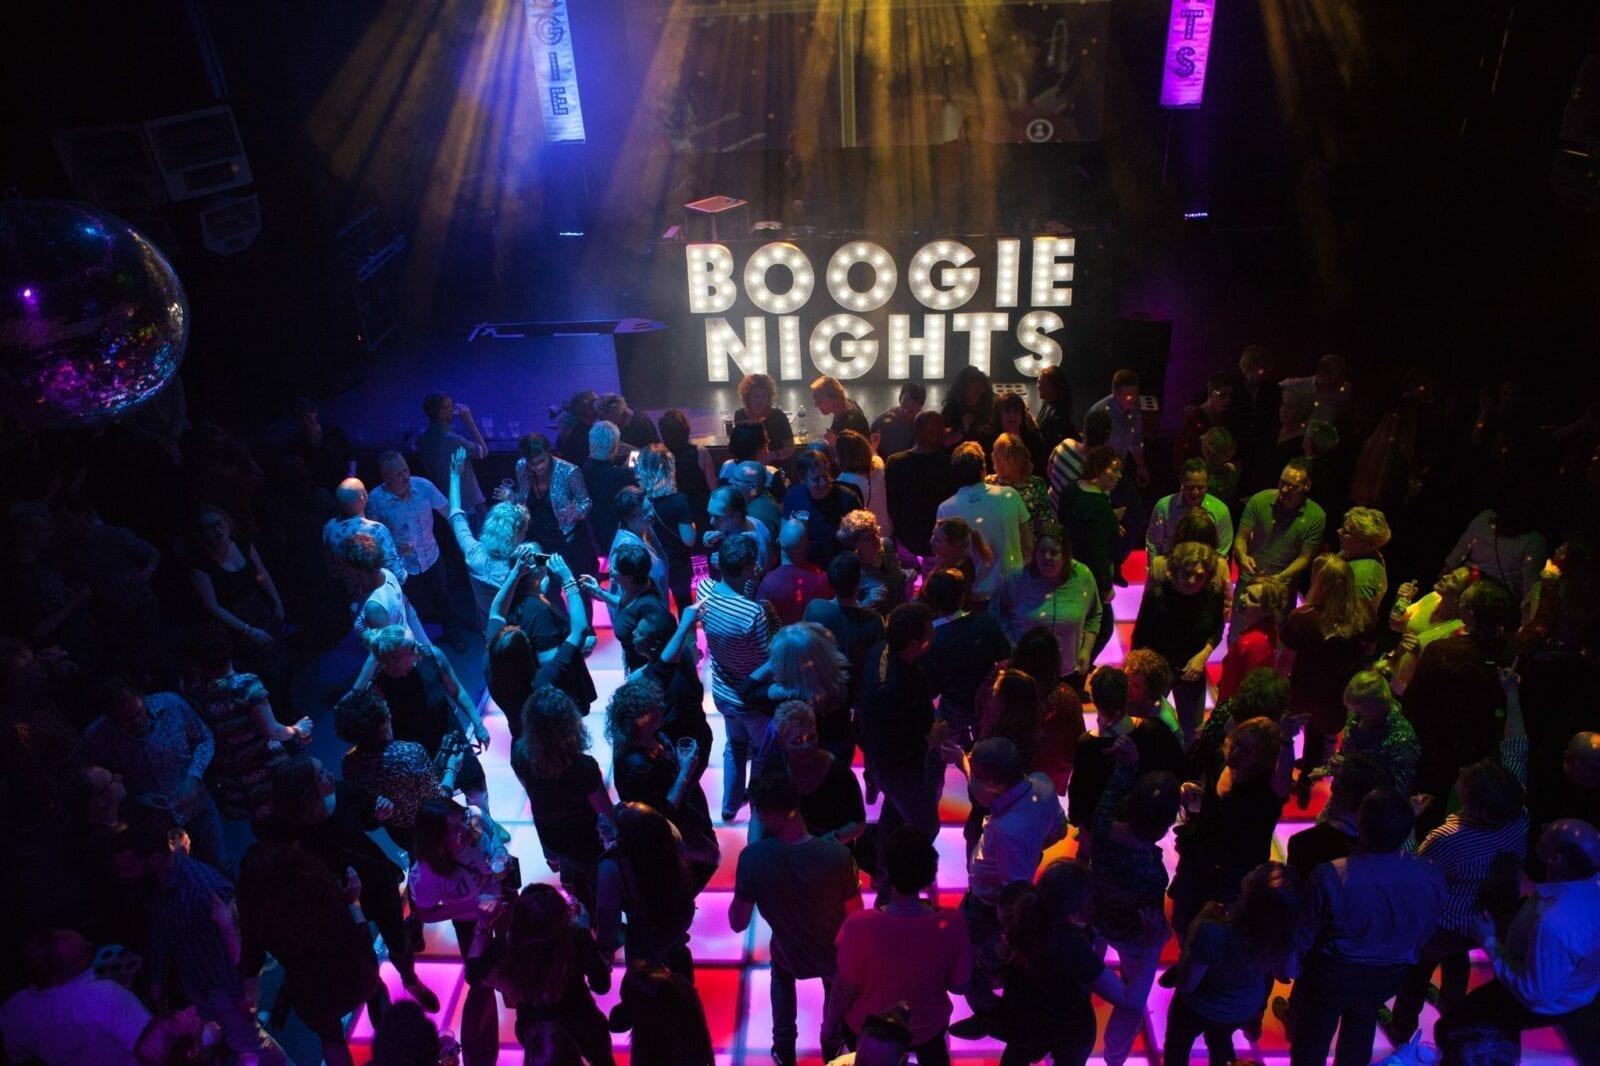 Boogie Nights Neushoorn Leeuwarden